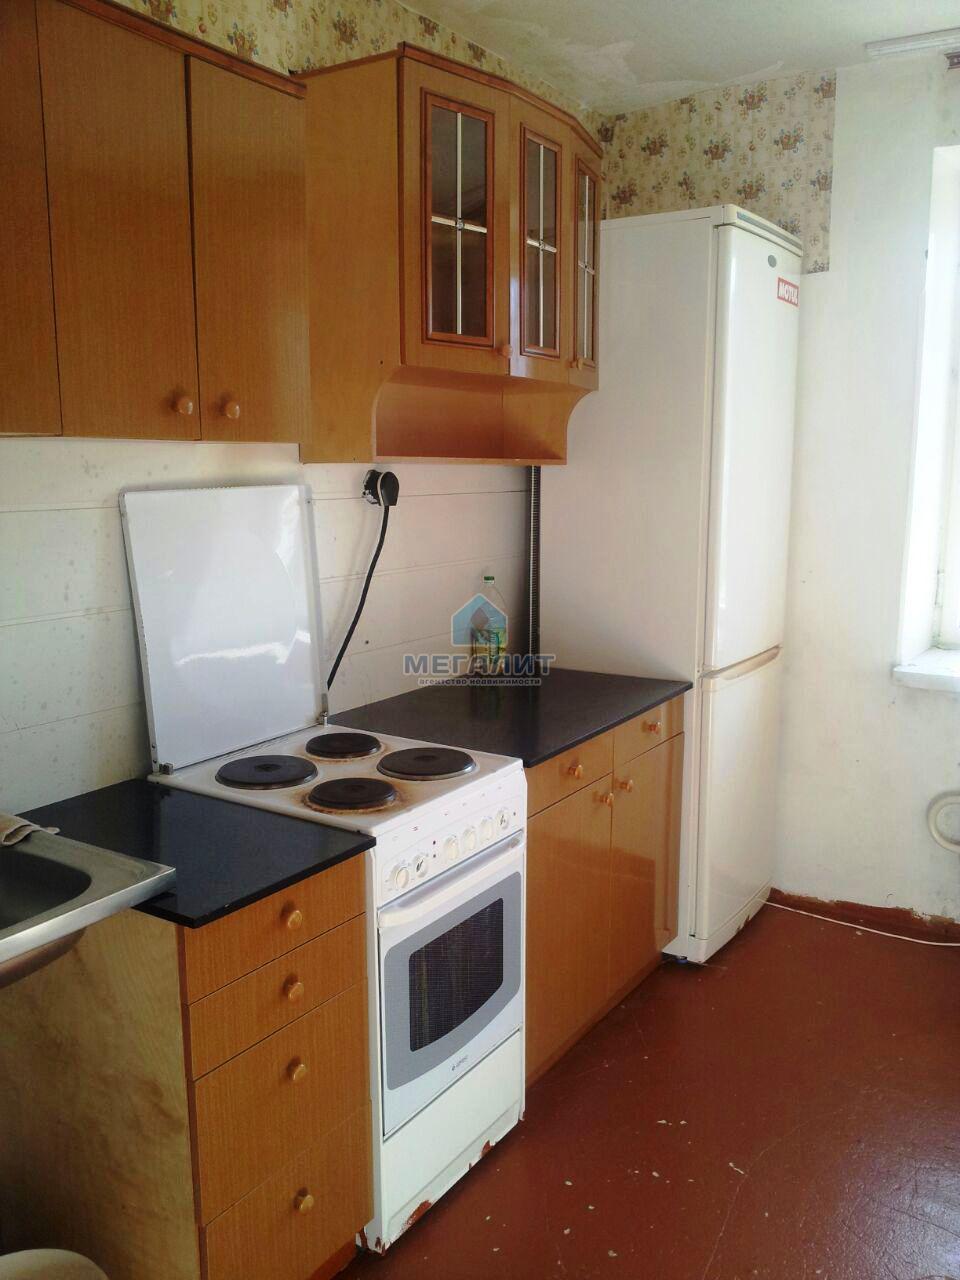 Двухкомнатная квартира в Ново-Савиновском районе! (миниатюра №8)